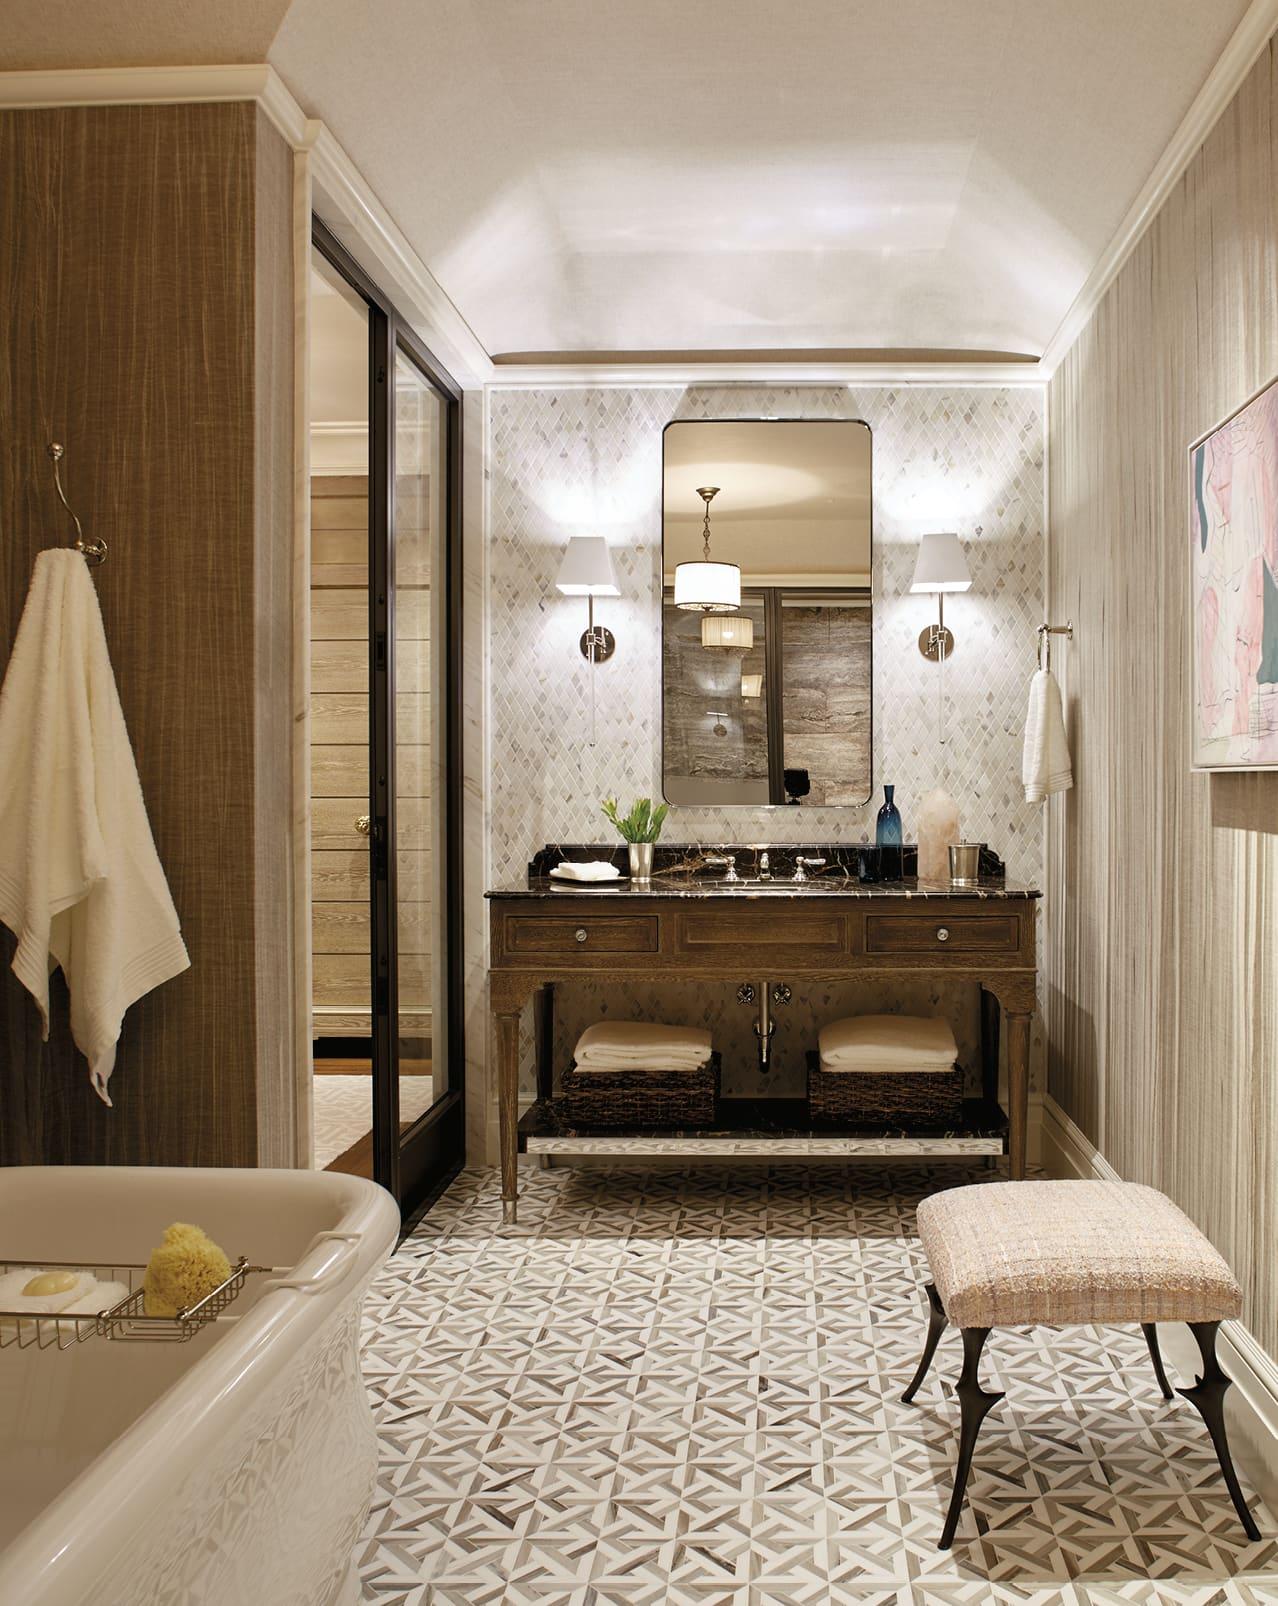 Bathroom with textured floor and walls